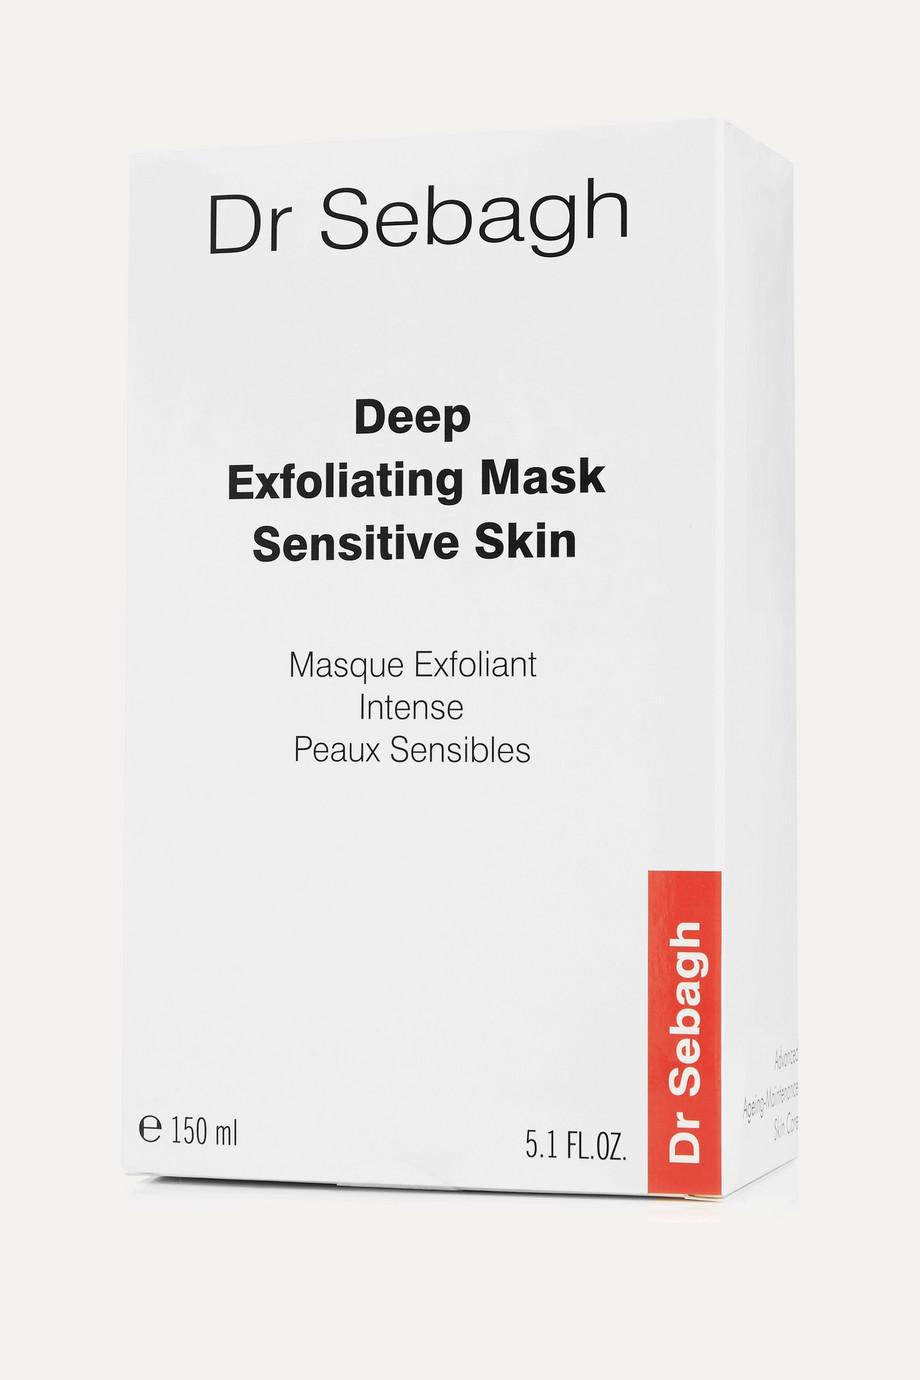 Dr Sebagh Deep Exfoliating Mask Sensitive Skin, 150 ml – Peelingmaske